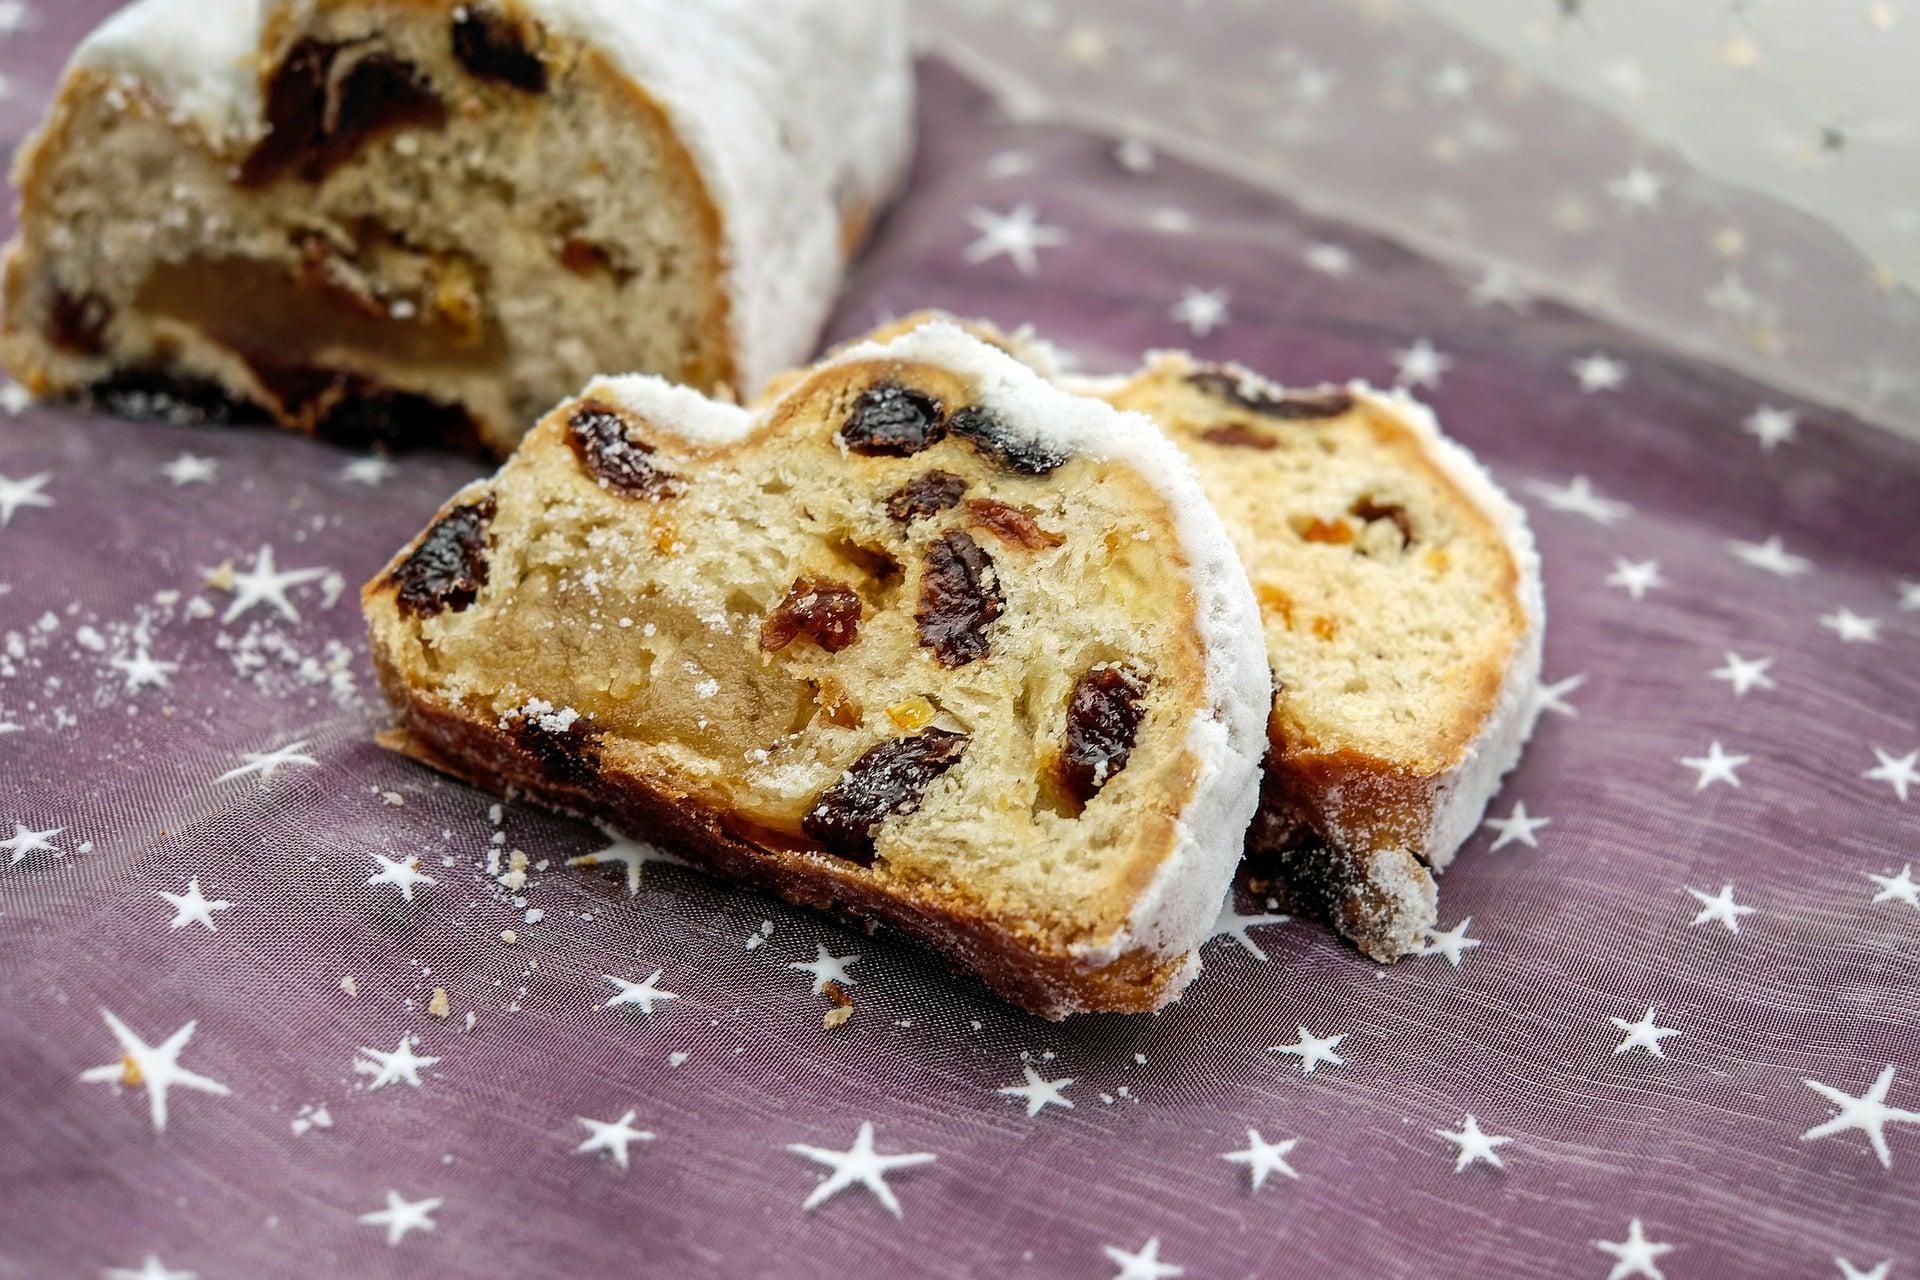 German Christmas stollen bread